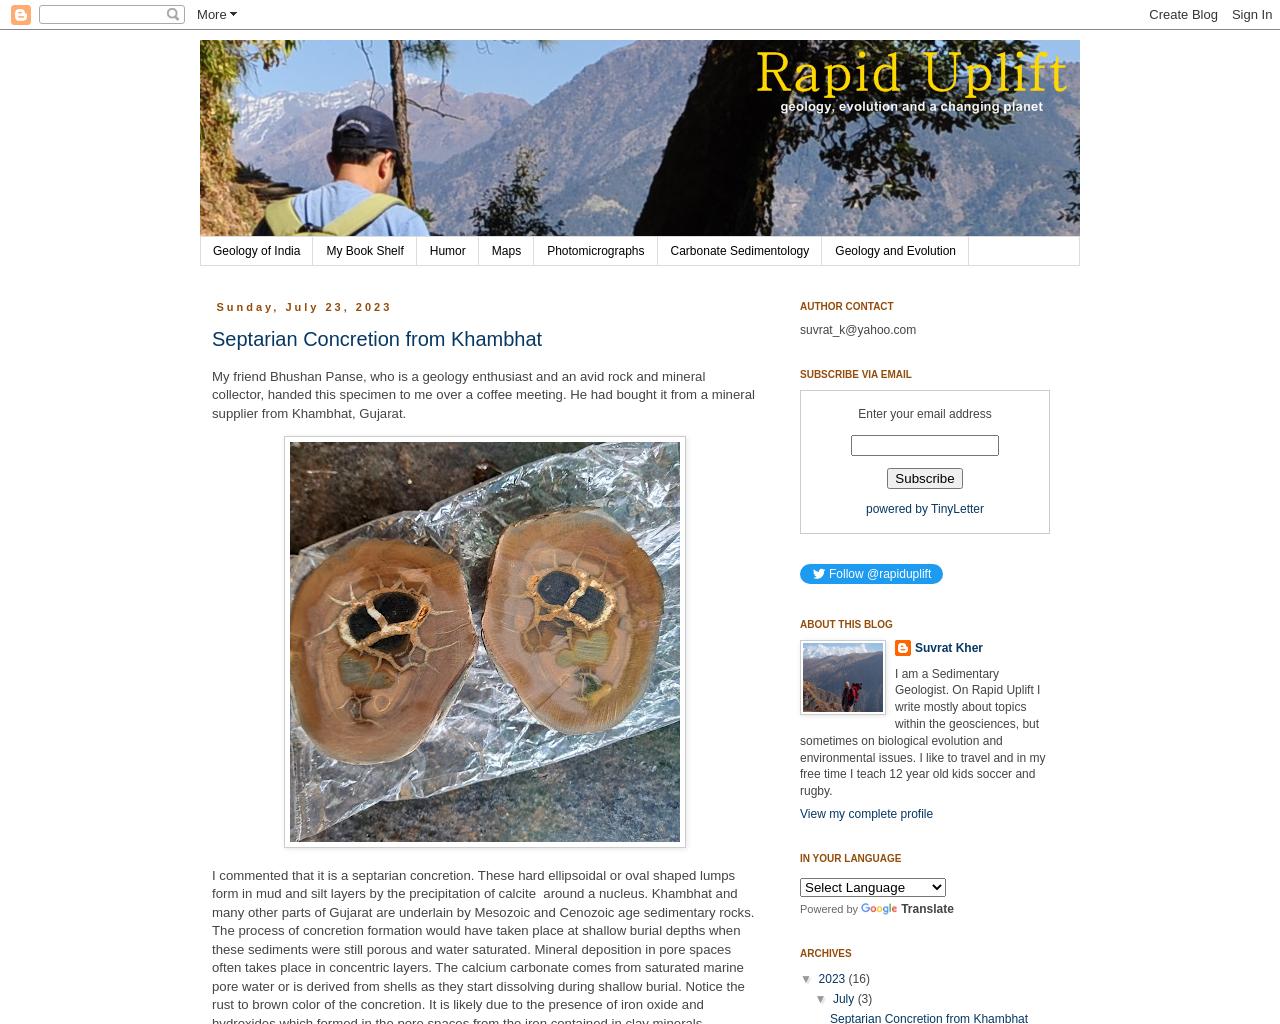 Rapid Uplift